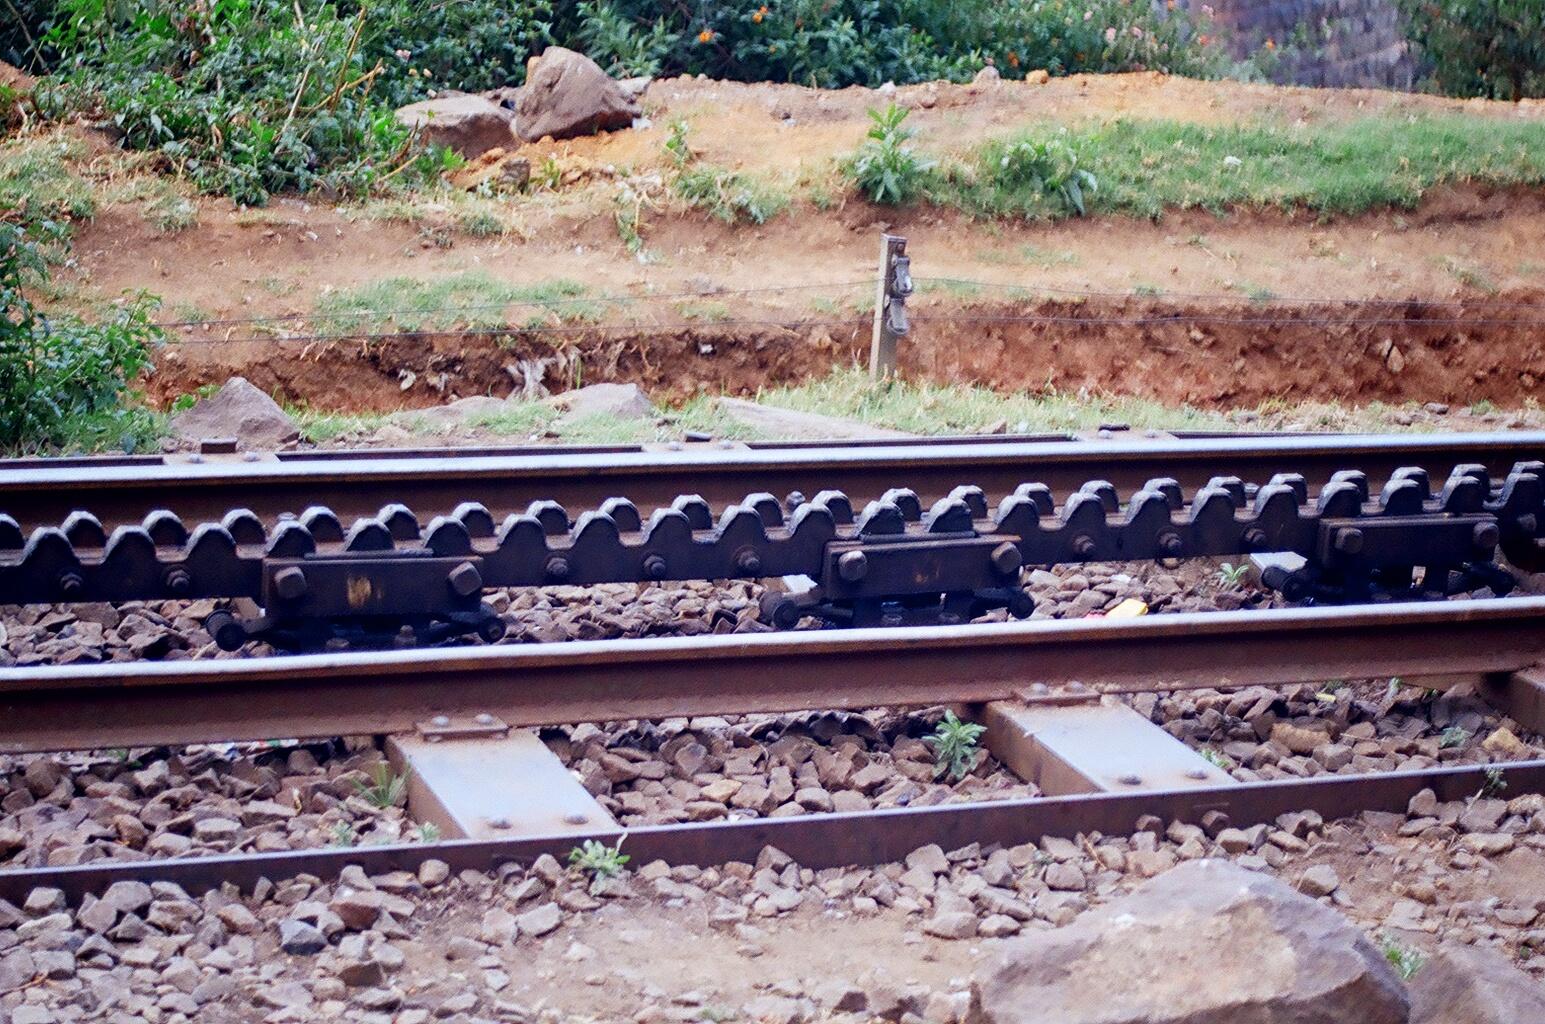 Rack seen between the two tracks